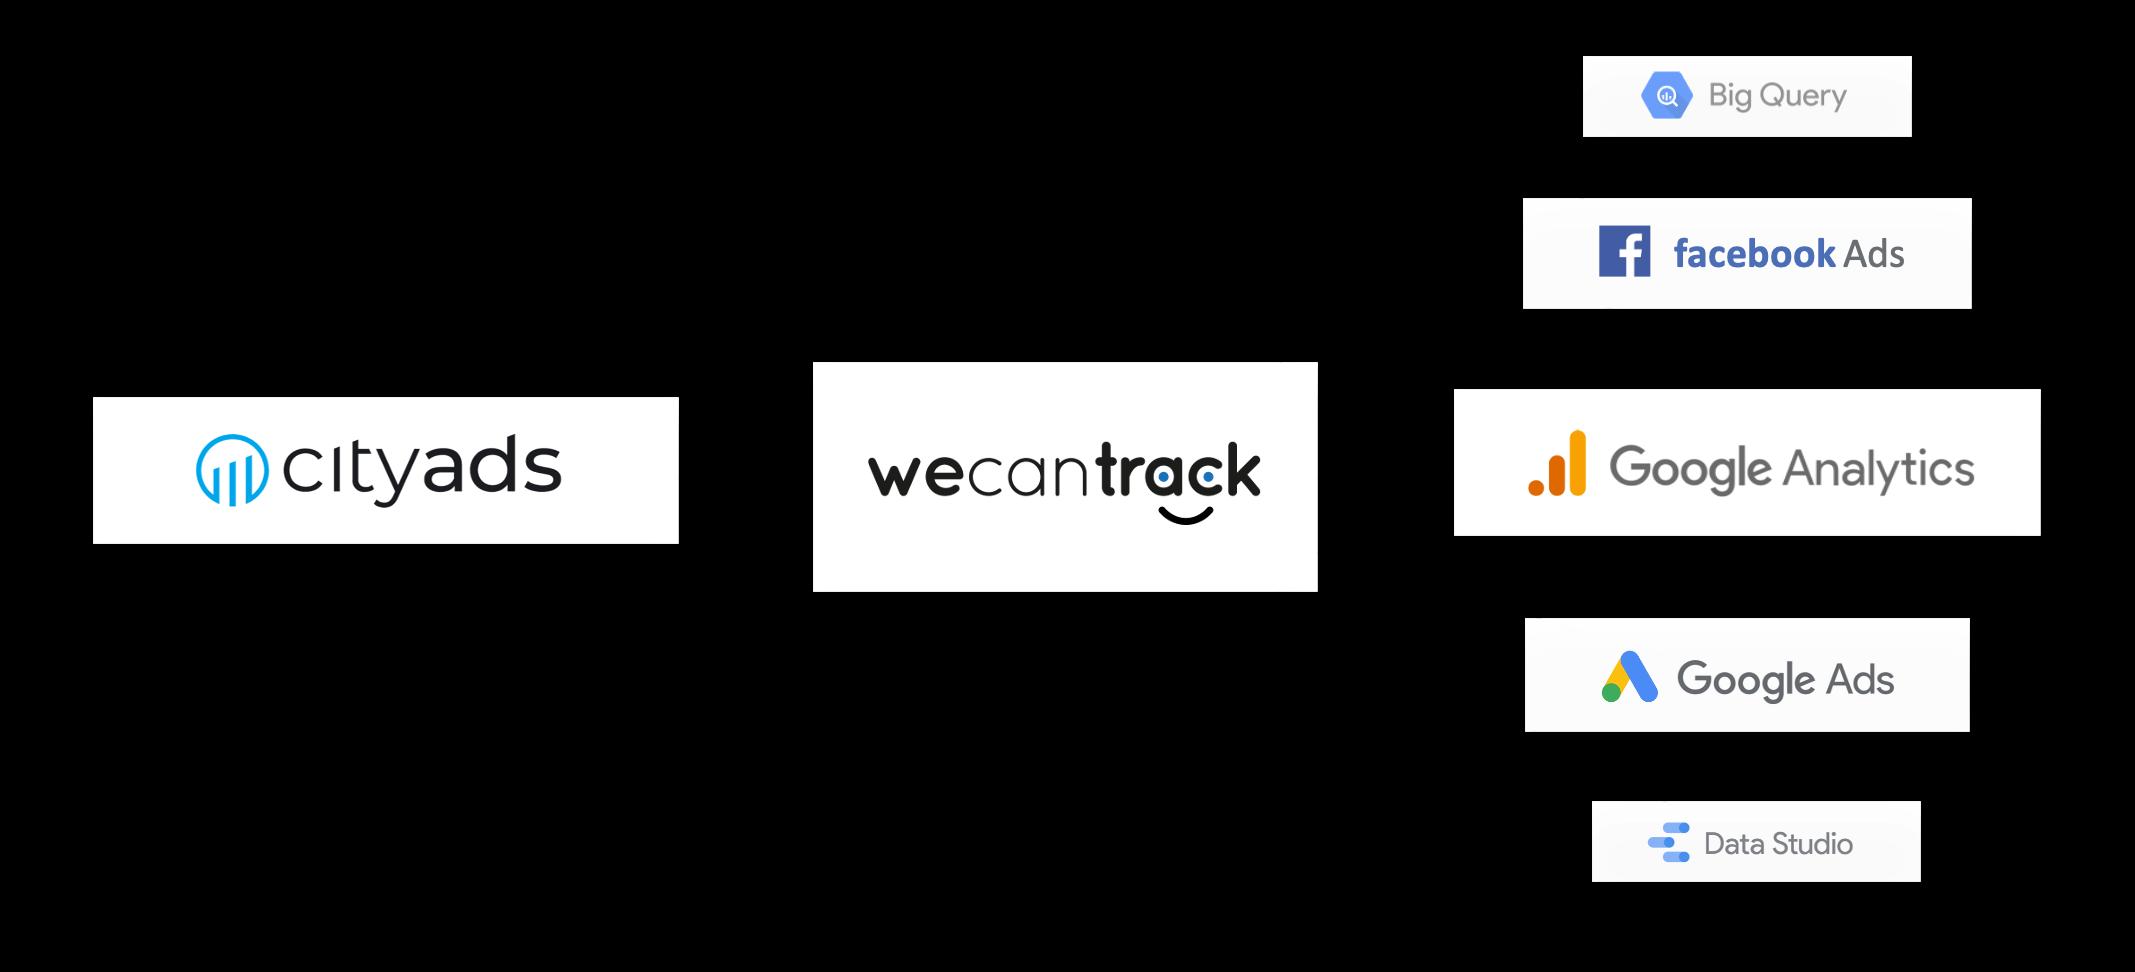 integrate-cityads-affiliate-conversions-via-postback-url